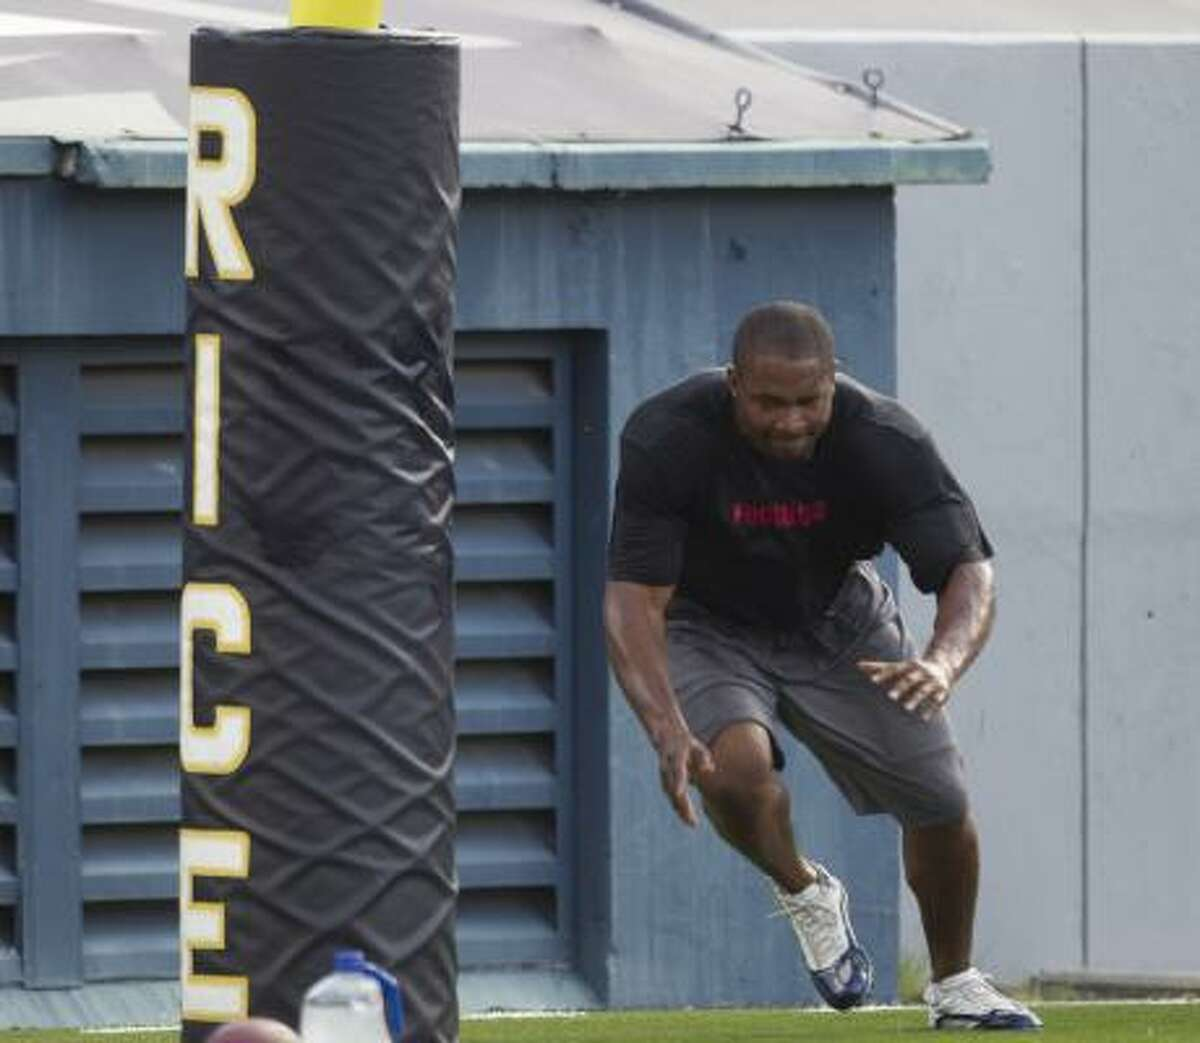 Texans defensive lineman Amobi Okoye warms up near the endzone.